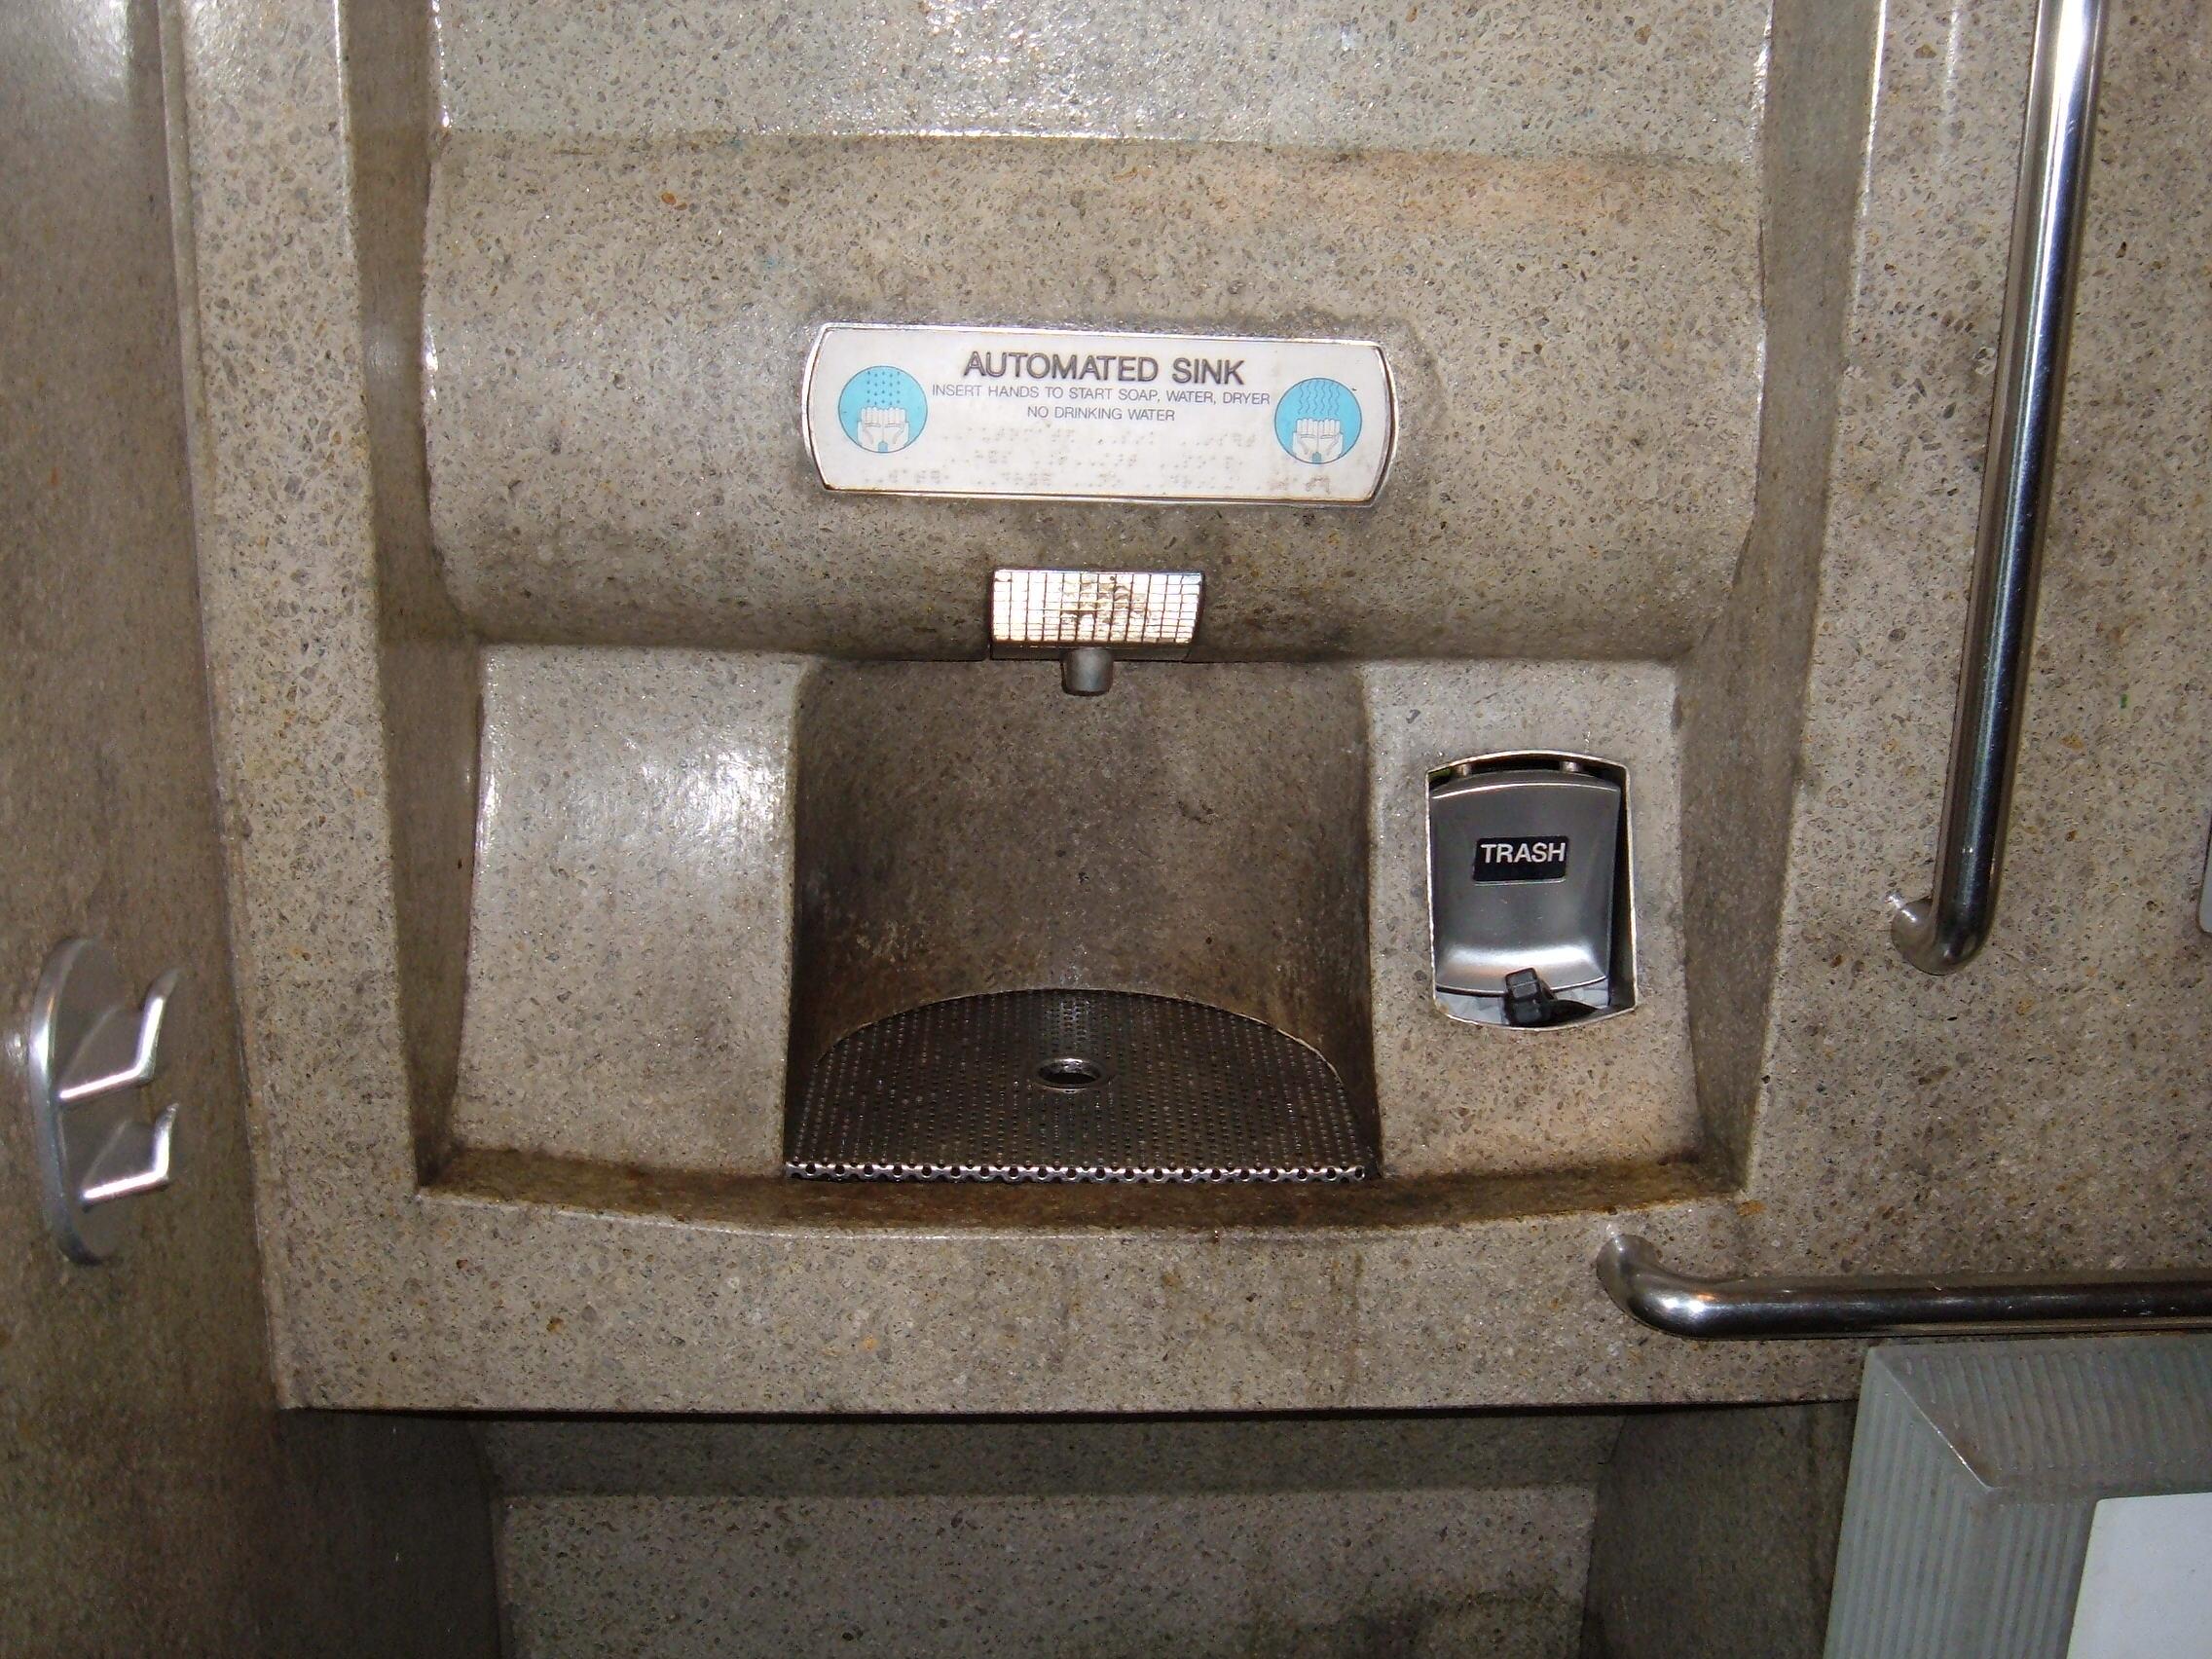 FileSan Francisco Public Toilet SinkJPG